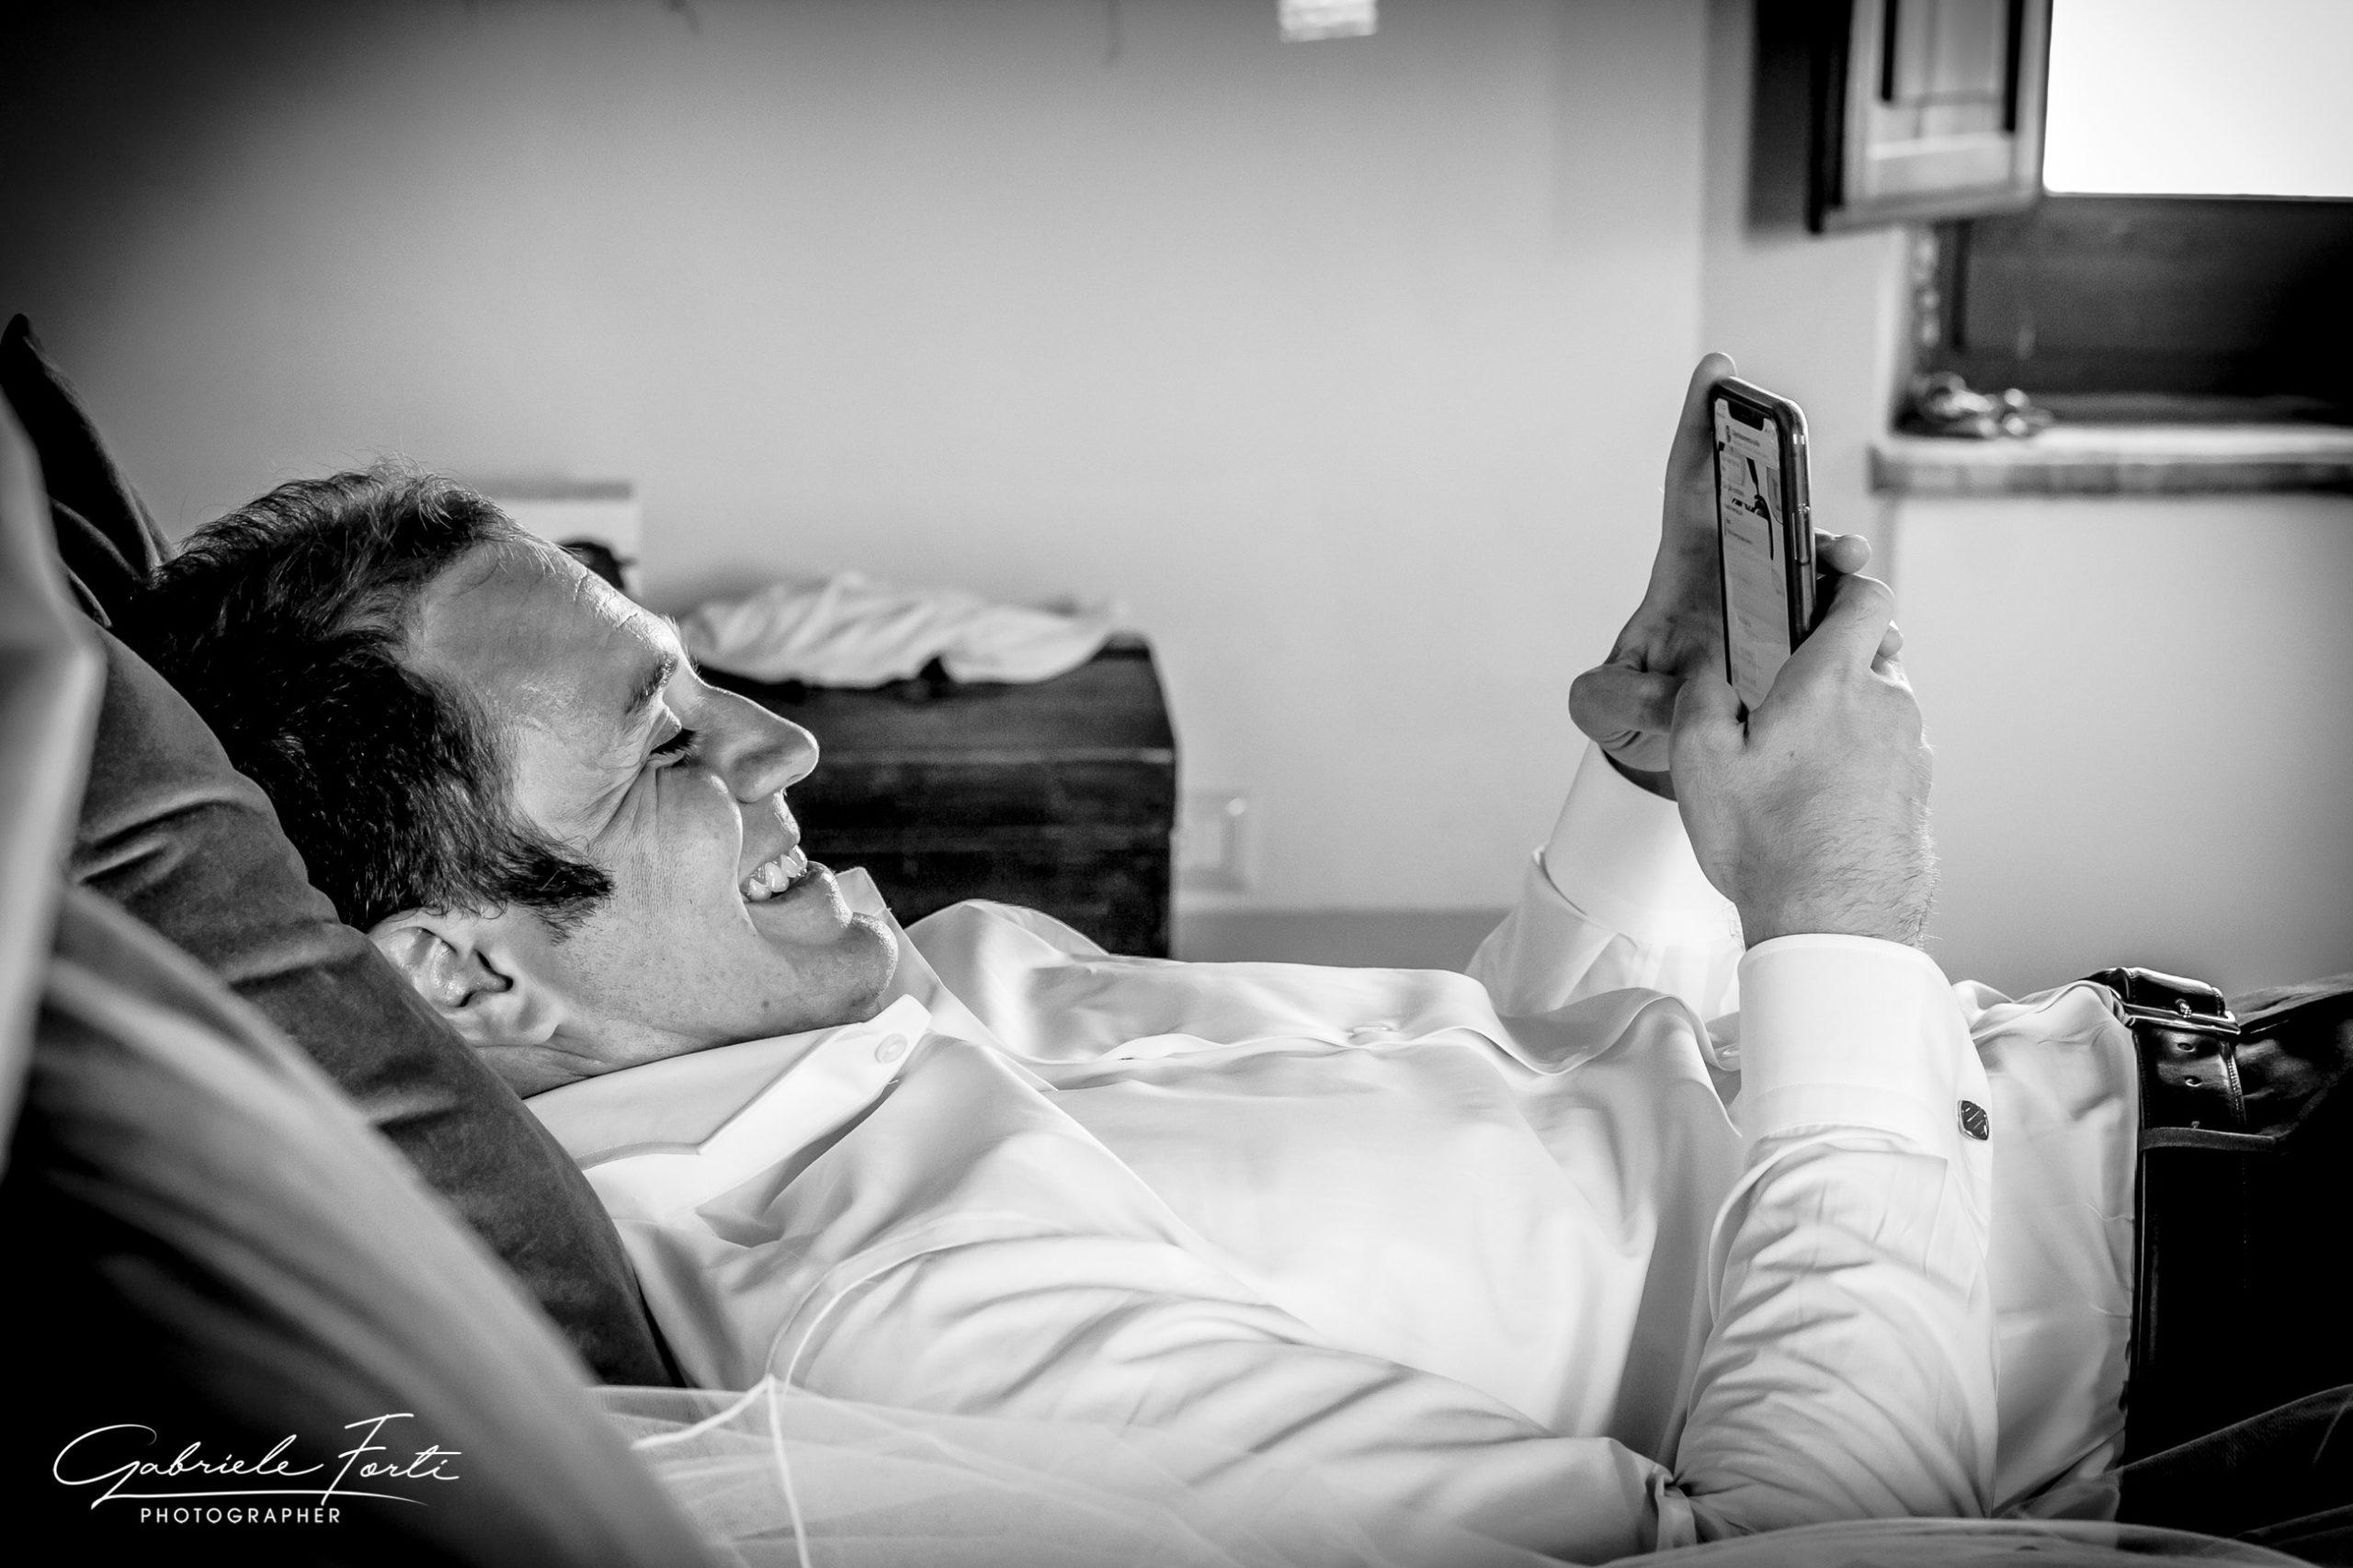 wedding-japan-tuscany-locanda-in-tuscany-photographer-siena-foto-forti-gabriele-5